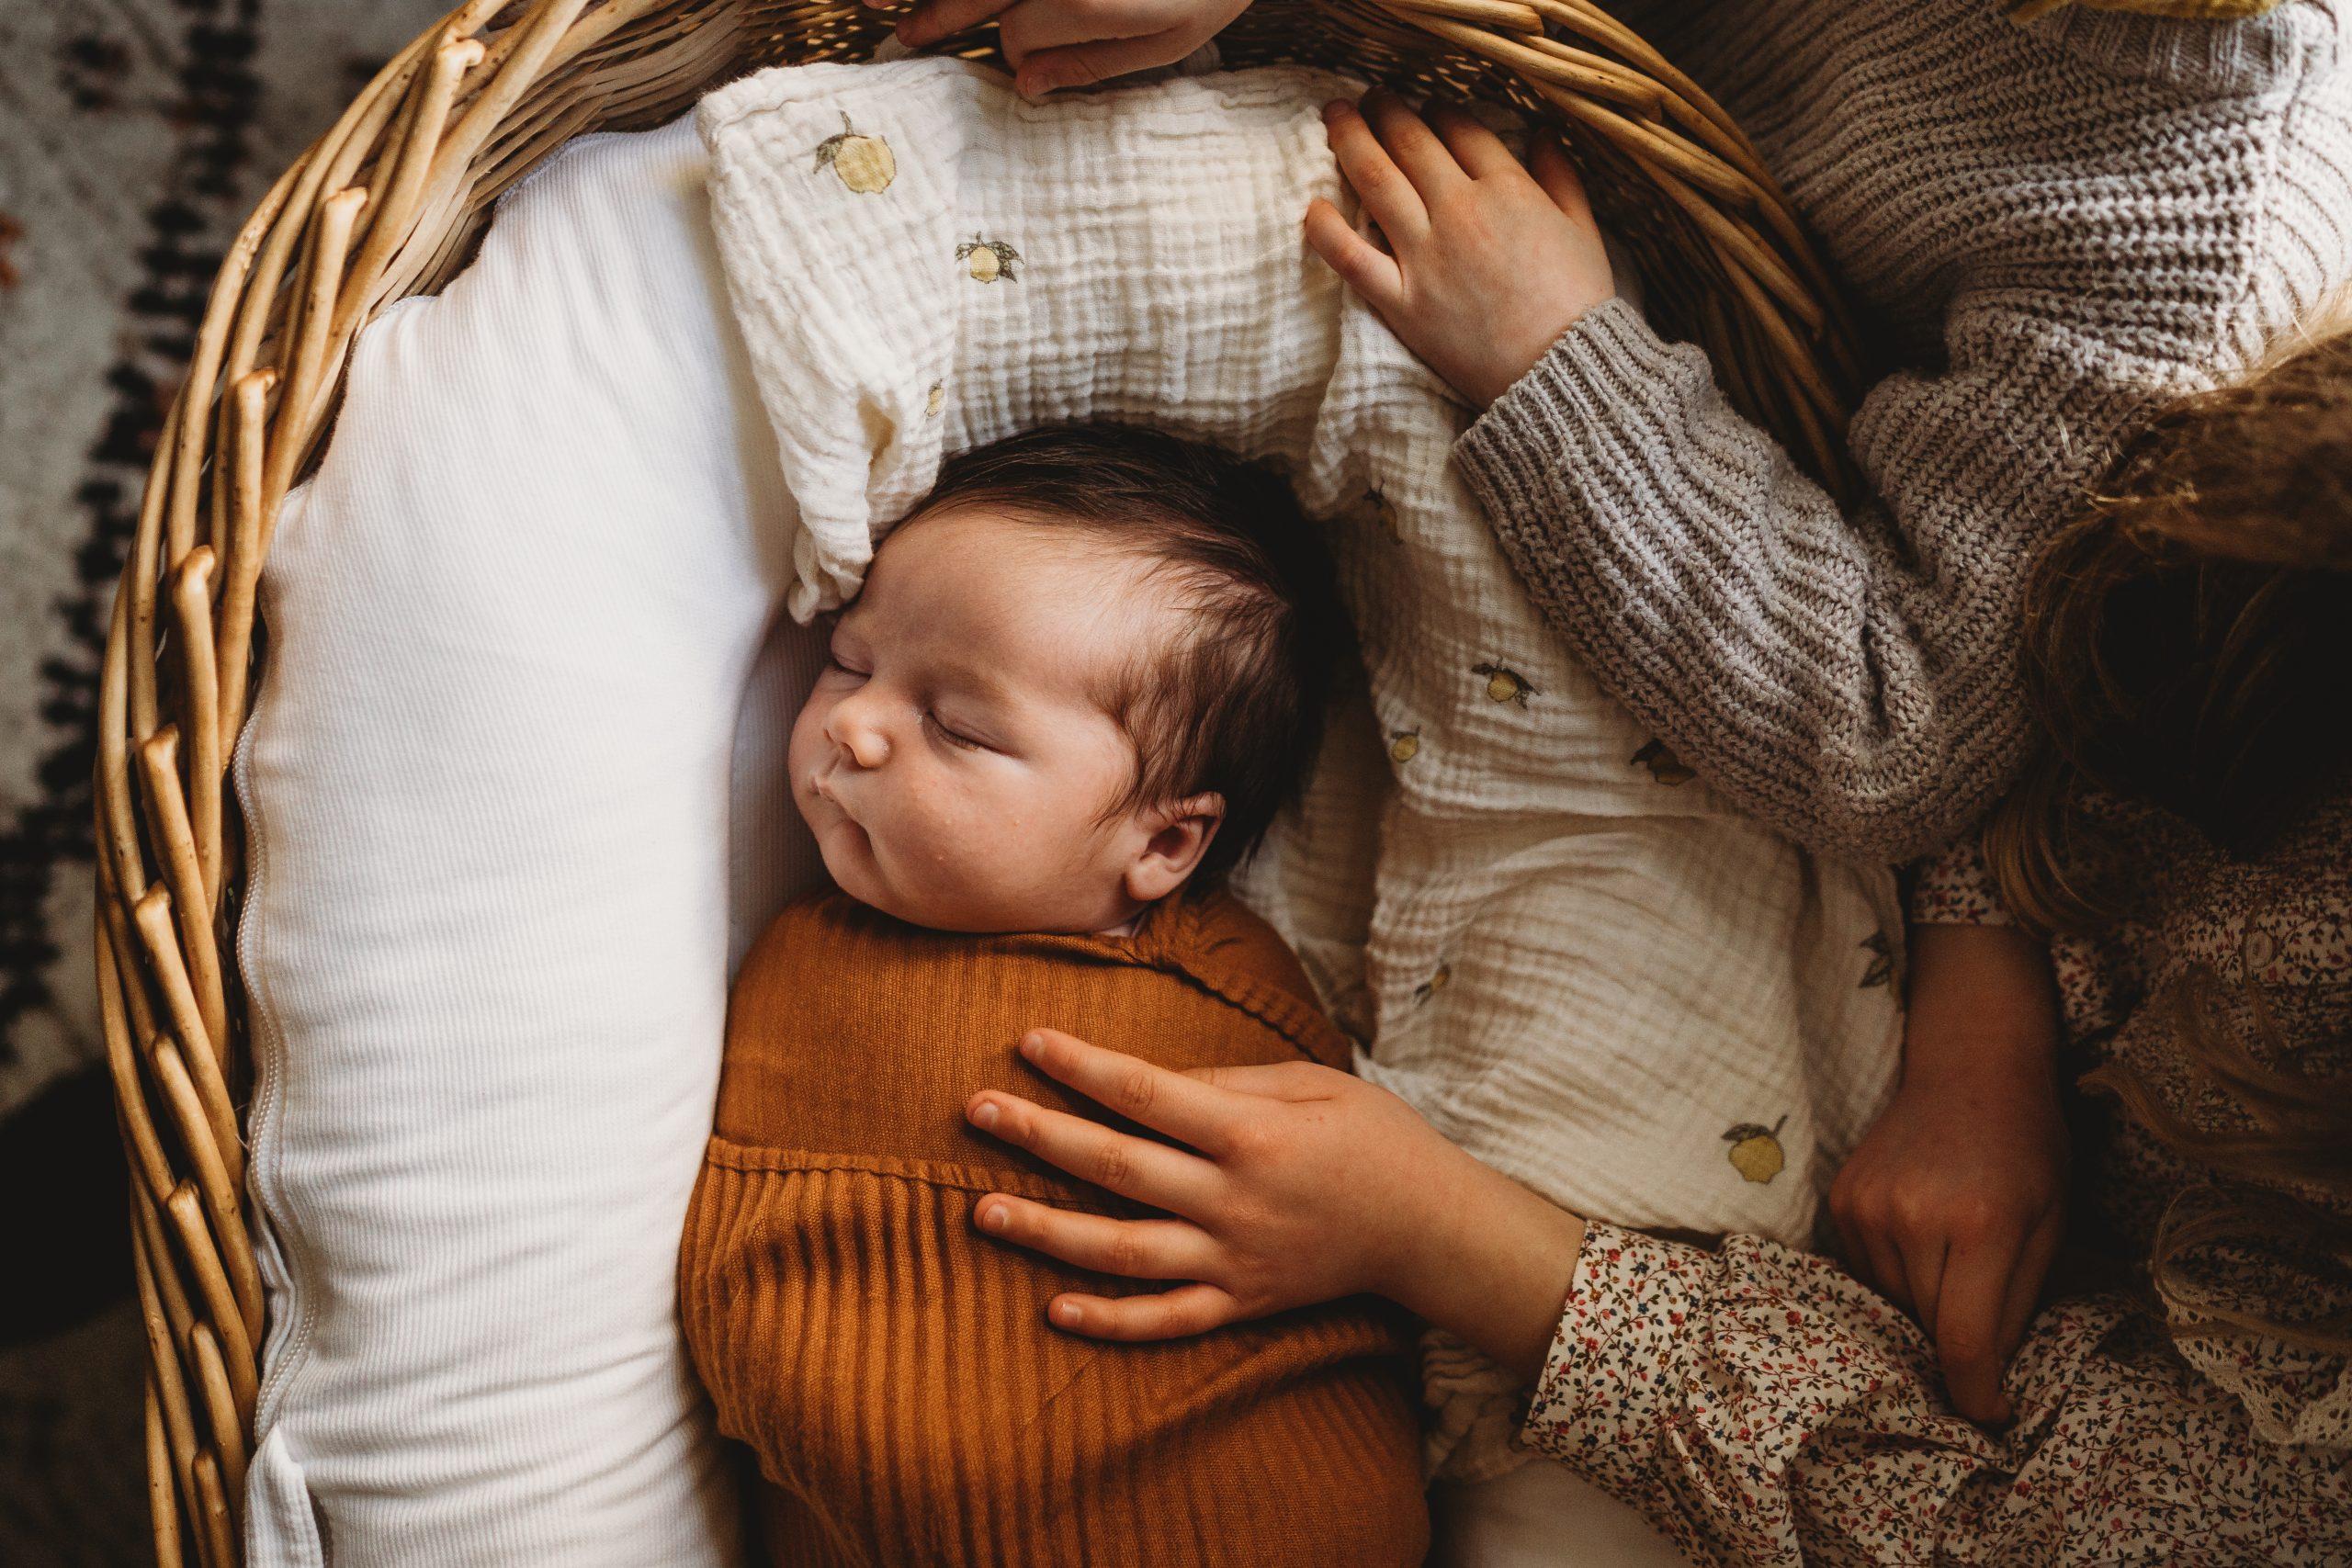 family cuddling on saiofa at home with newborn